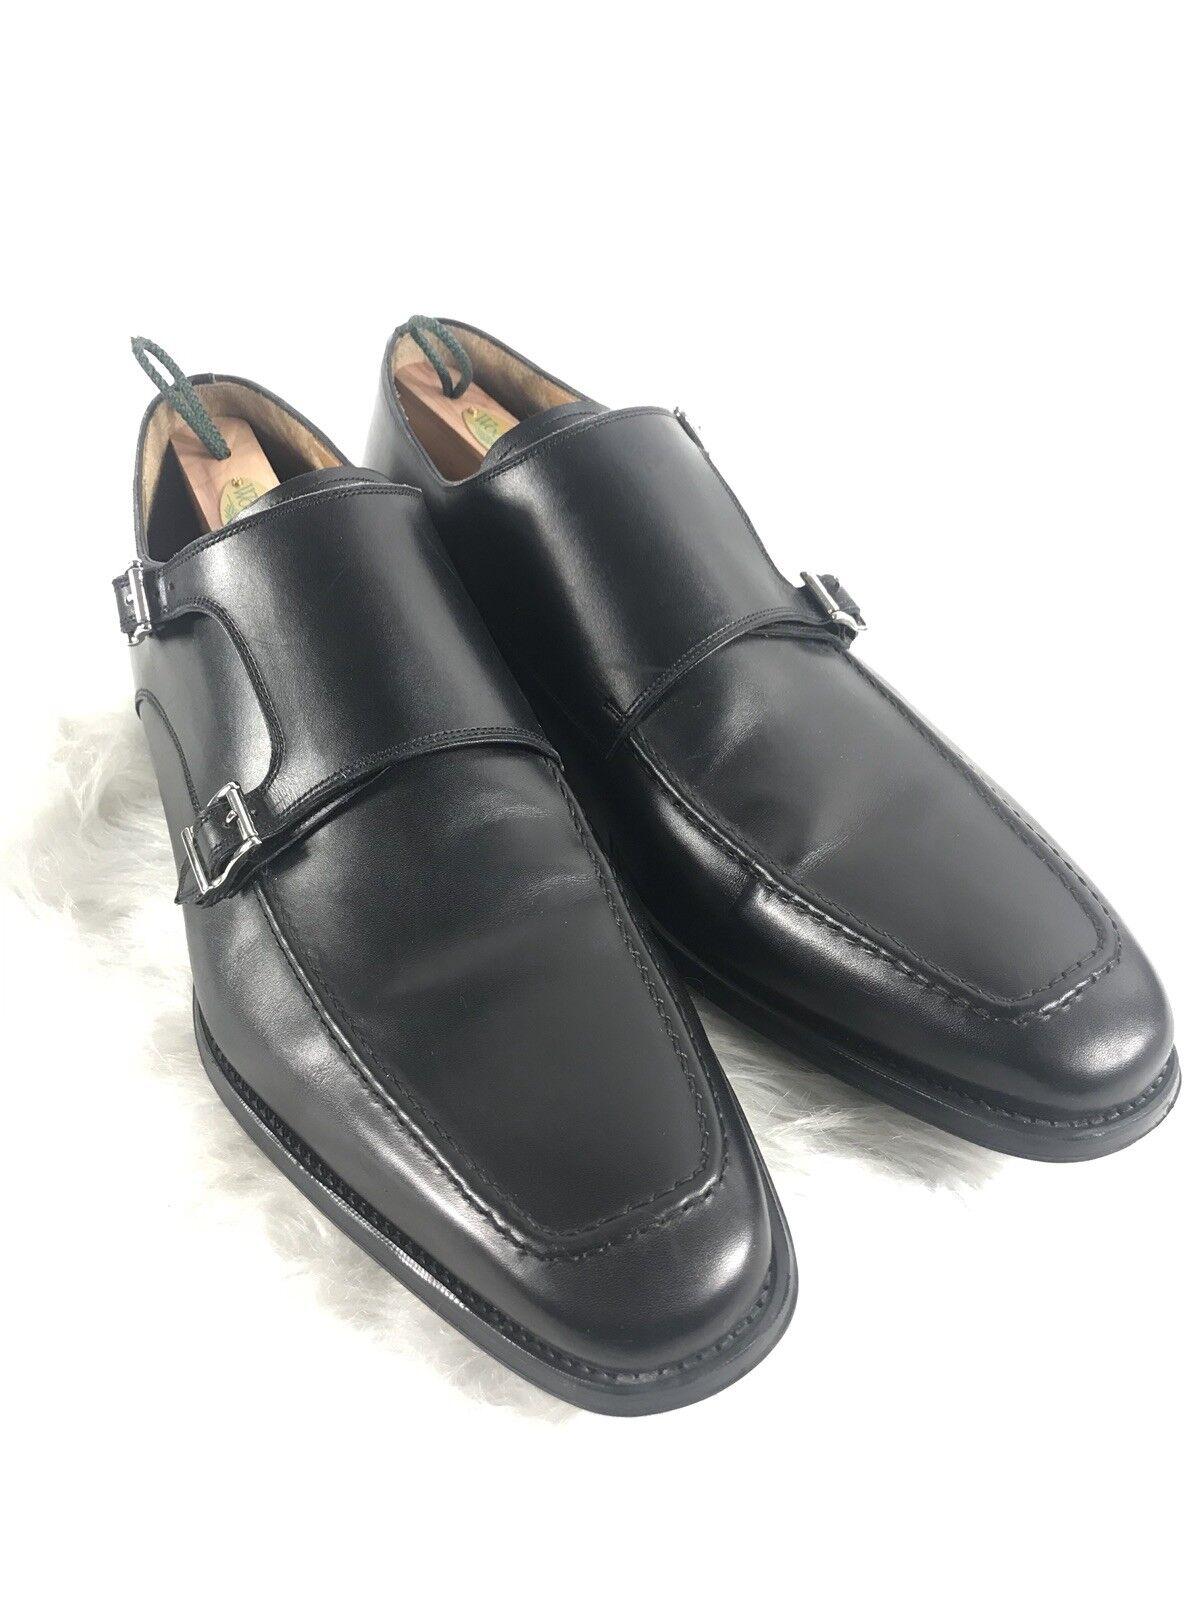 Magnanni Miro Men's Double Monk Strap Black Leather Loafer shoes Size 14